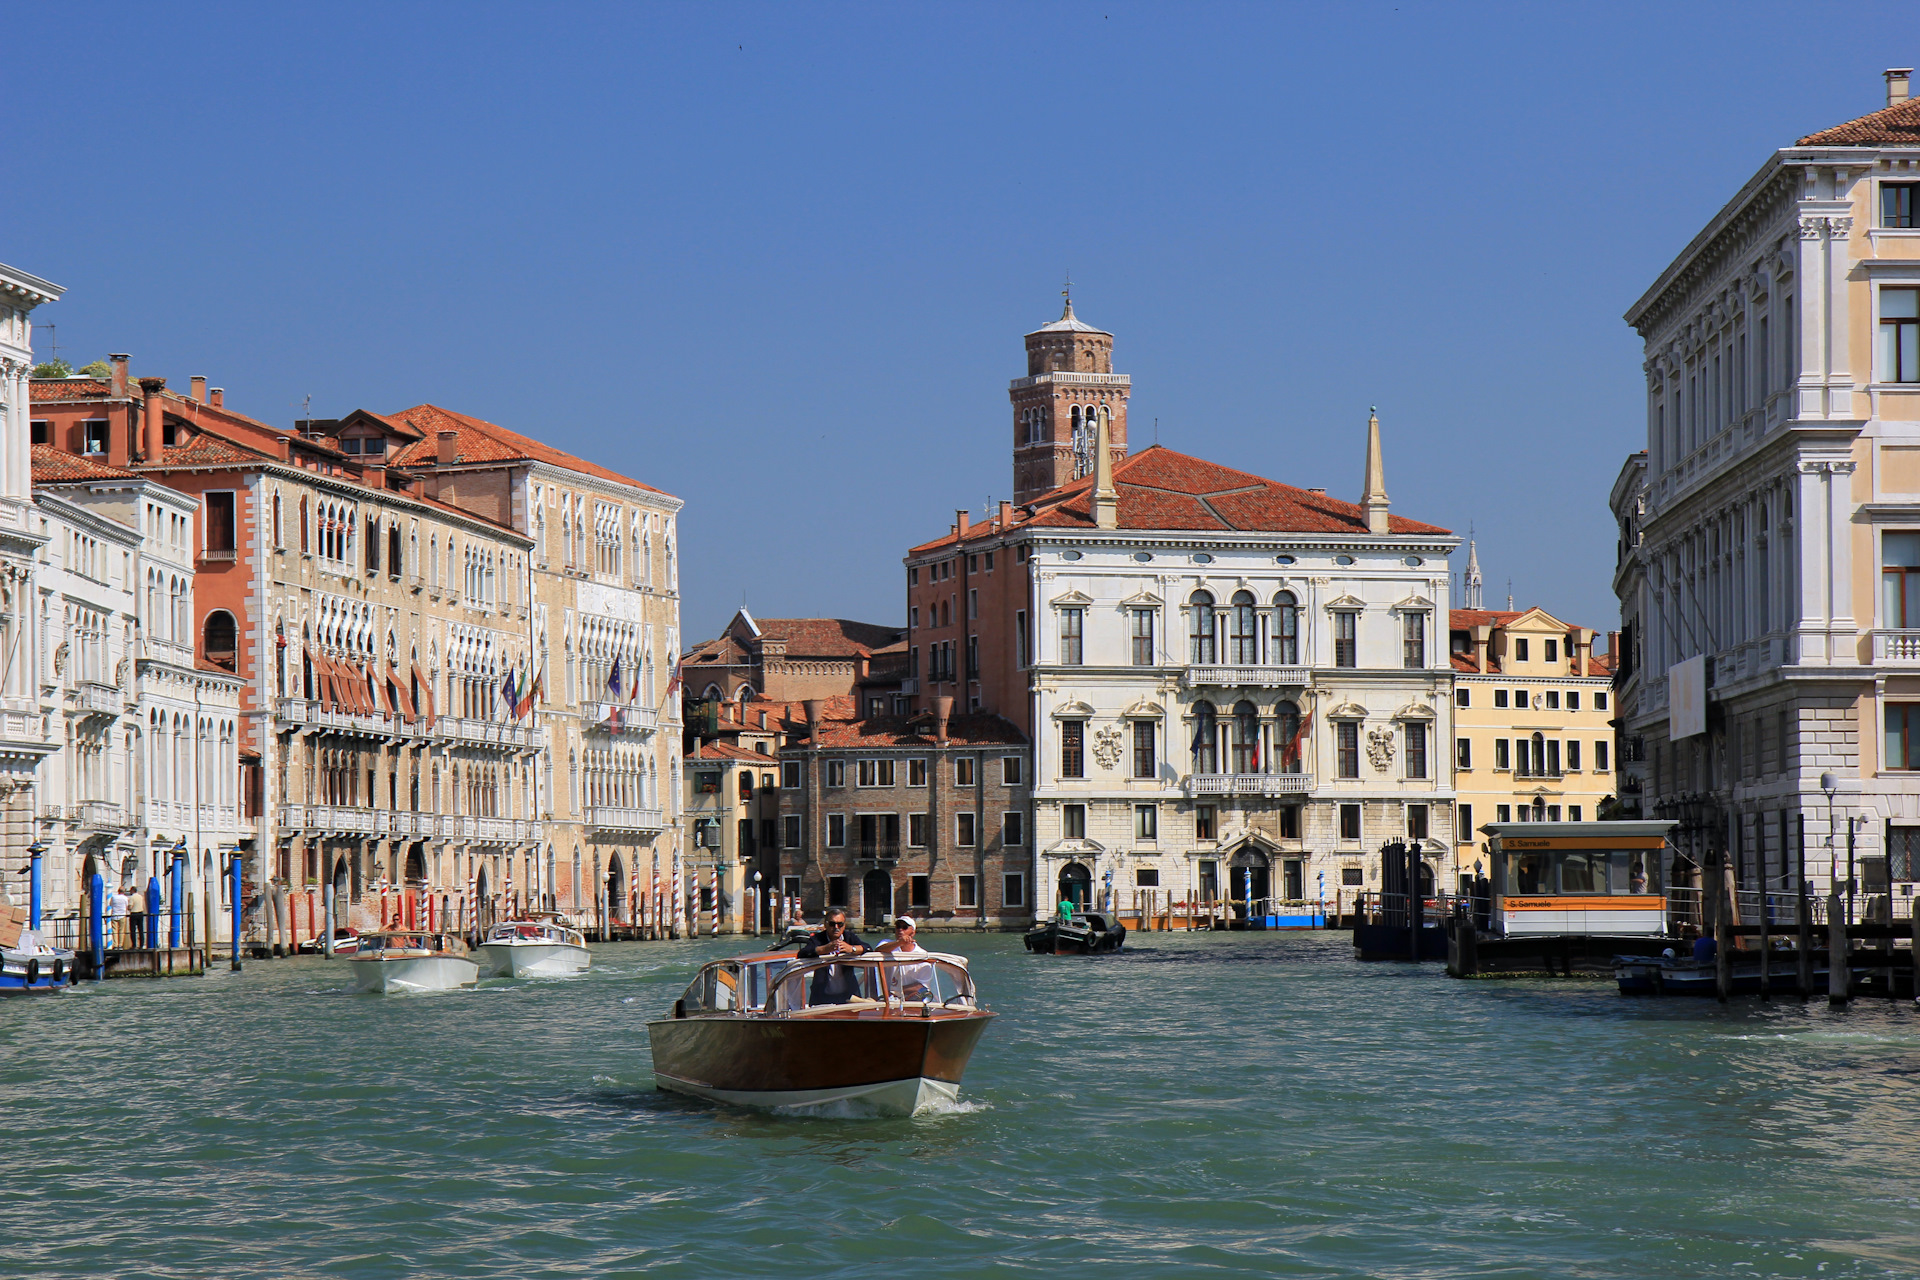 люки венеции фото какие